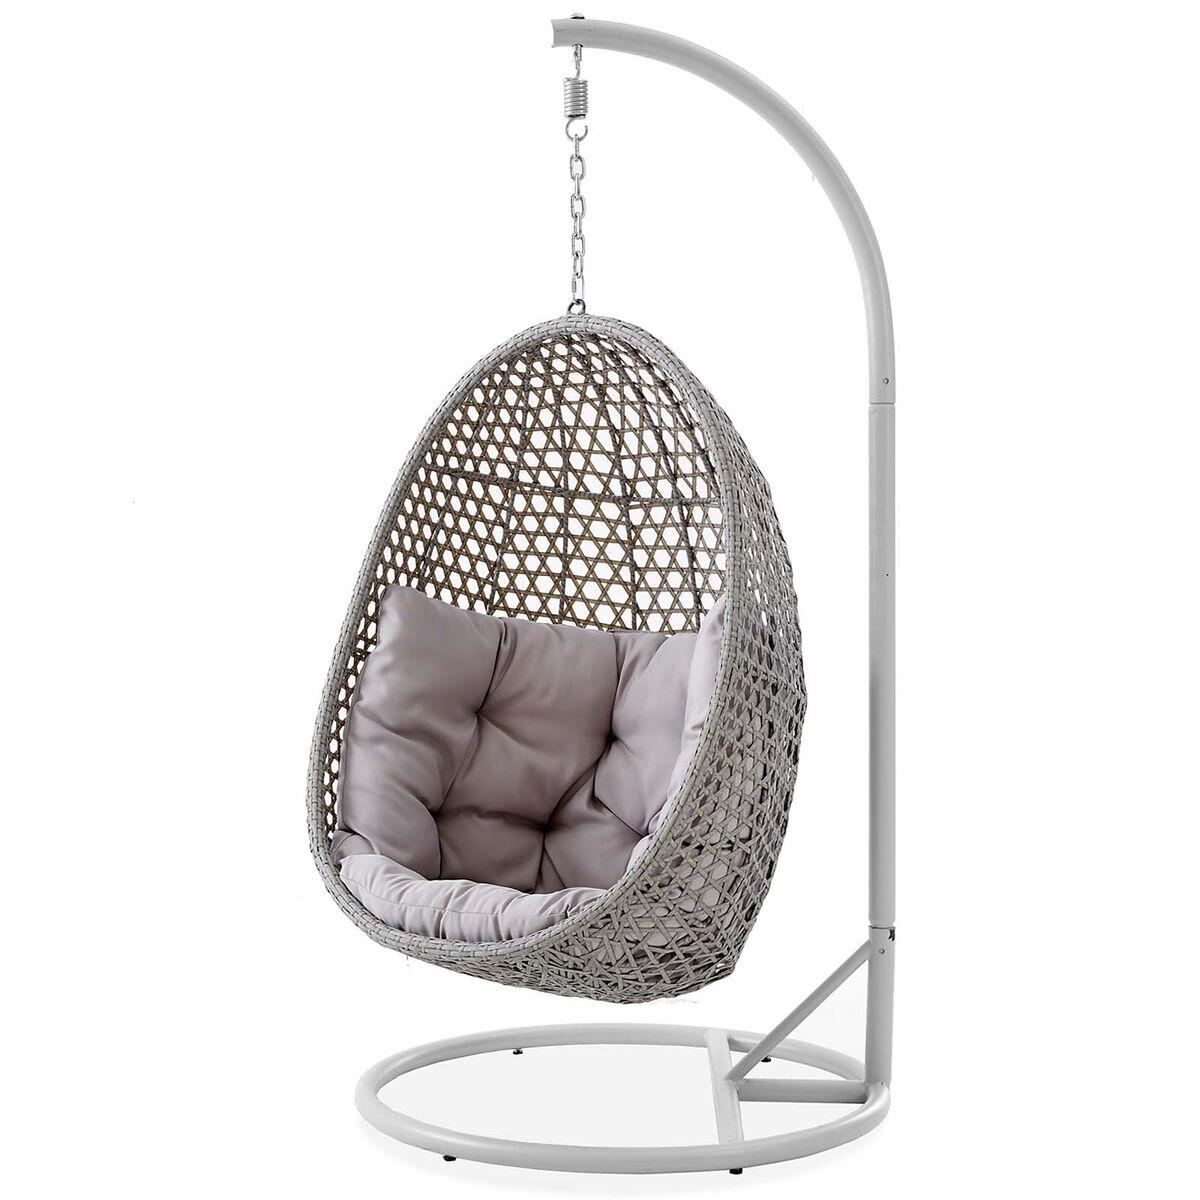 h ngestuhl polyrattan grau ca b 90 x h 190 x t 90 cm kissen 100 polyester depot de. Black Bedroom Furniture Sets. Home Design Ideas